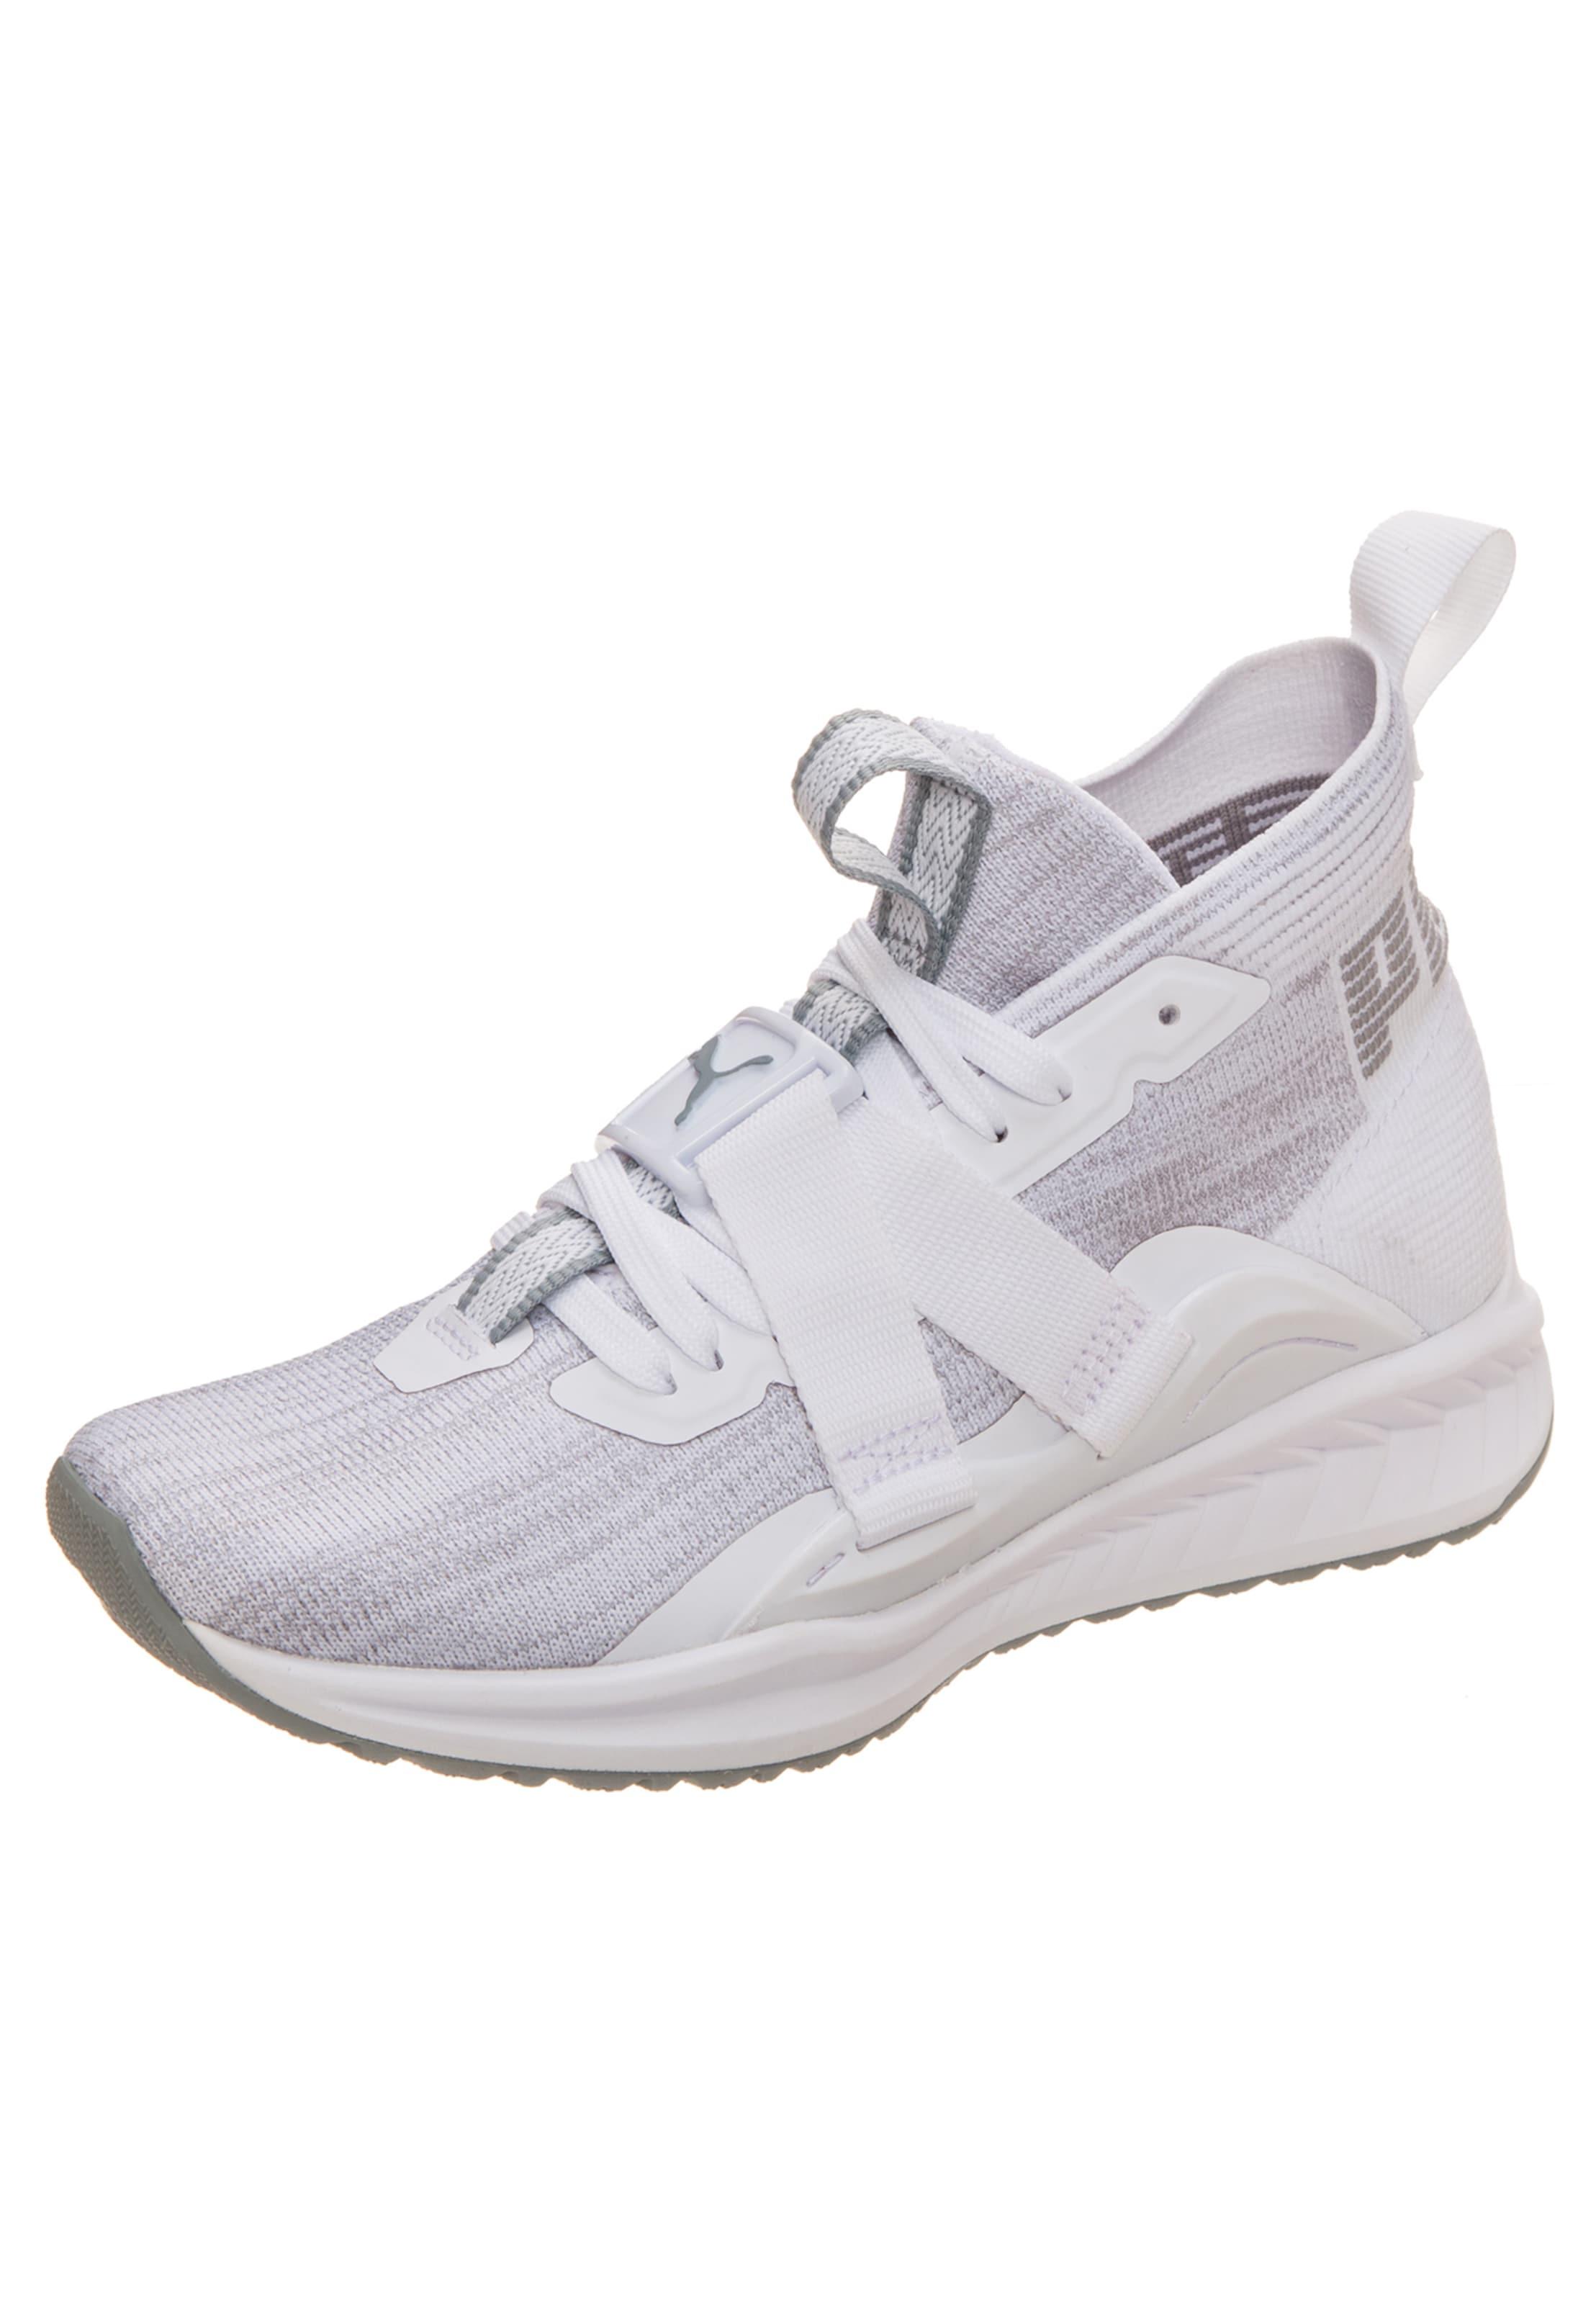 PUMA  Ignite evoKNIT 2  Sneaker